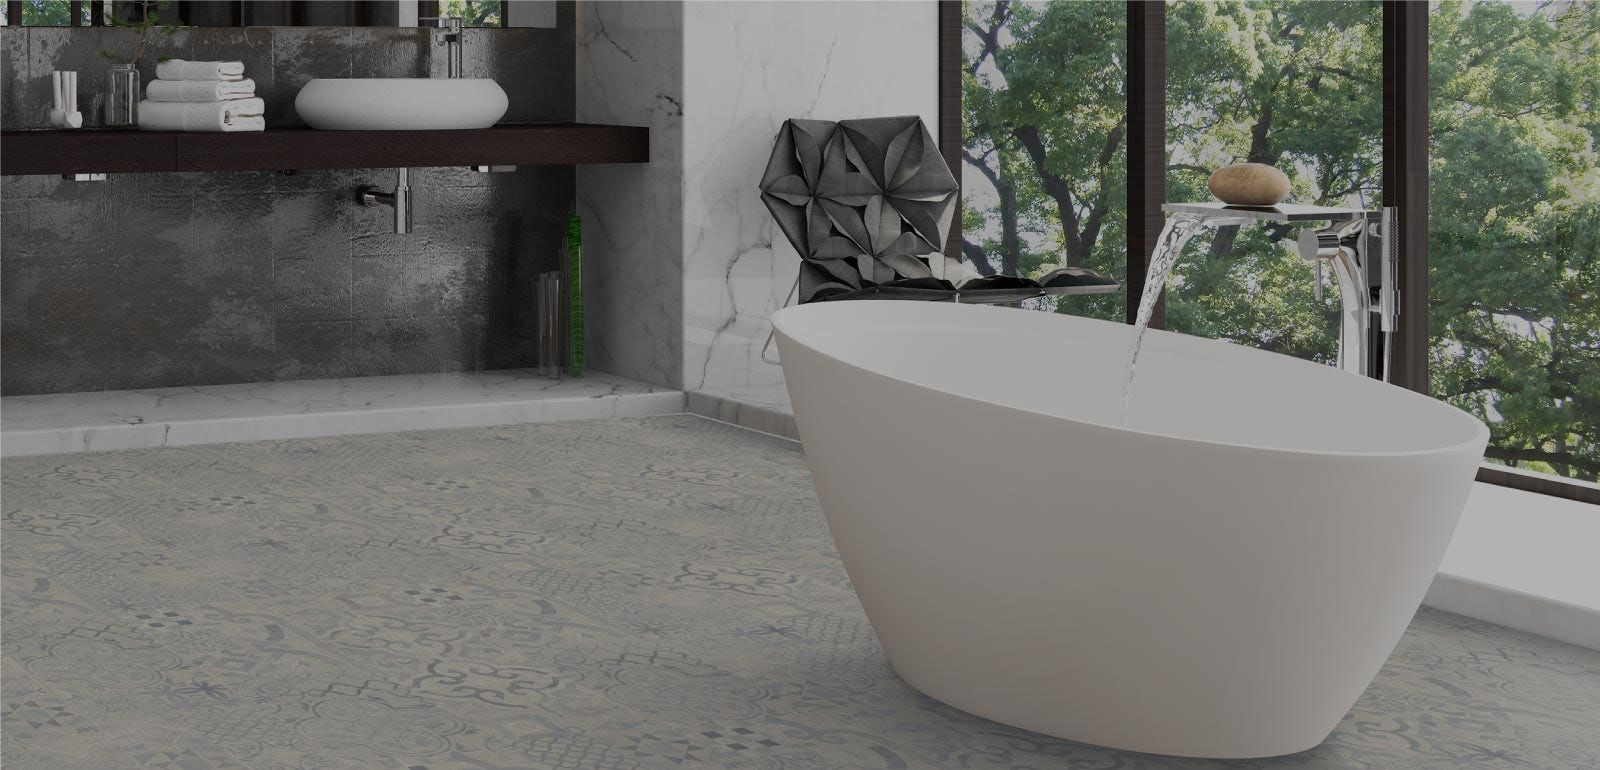 Create beautiful bathroom floors with new, easy-fit laminate and vinyl flooring